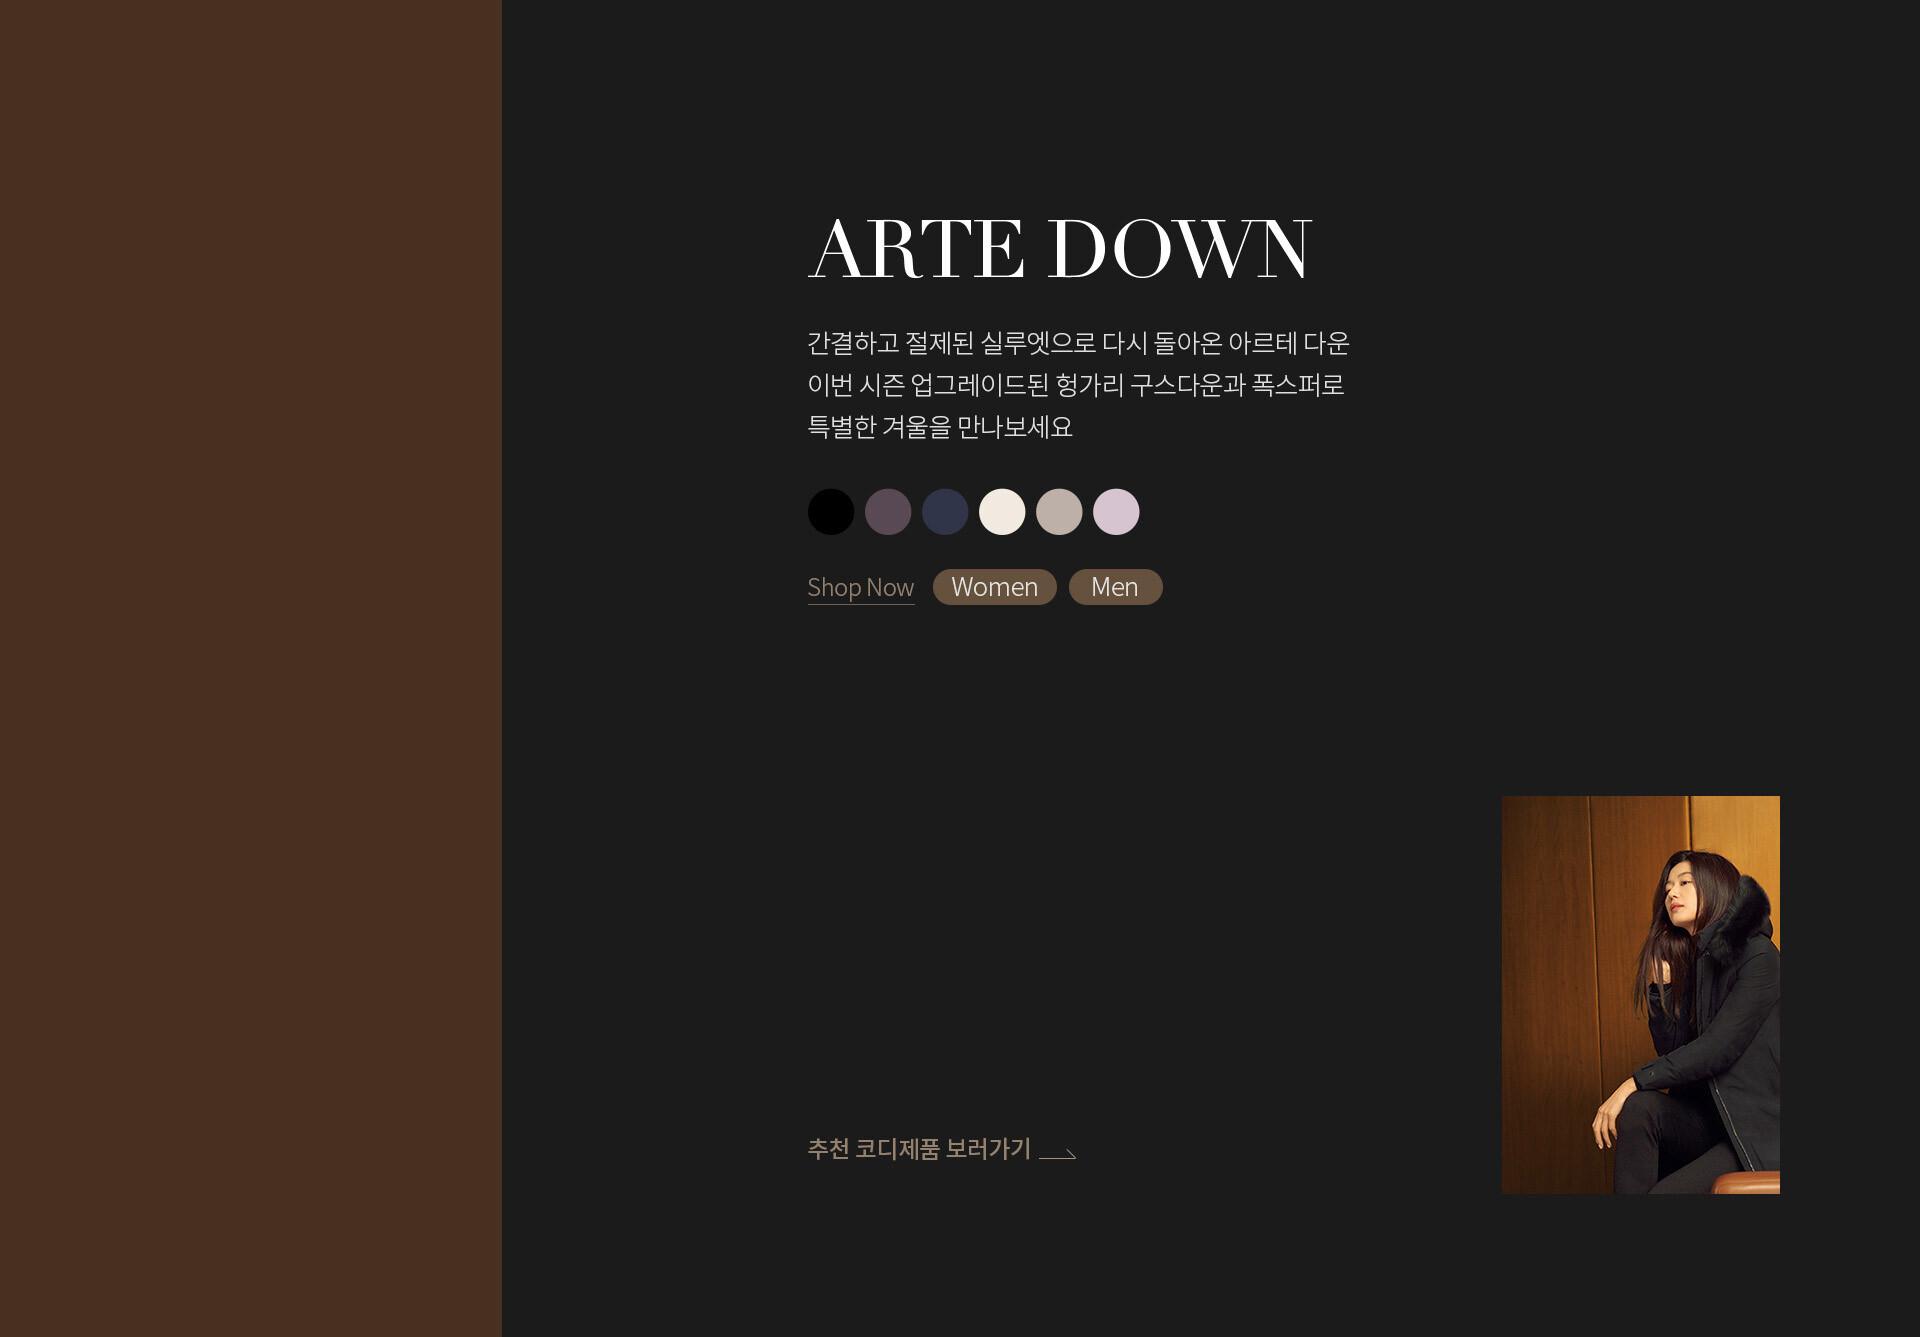 ARTE DOWN : 간결하고 절제된 실루엣으로 다시 돌아온 아르테 다운. 이번 시즌 업그레이드된 헝가리 구스다운과 폭스퍼로 특별한 겨울을 만나보세요